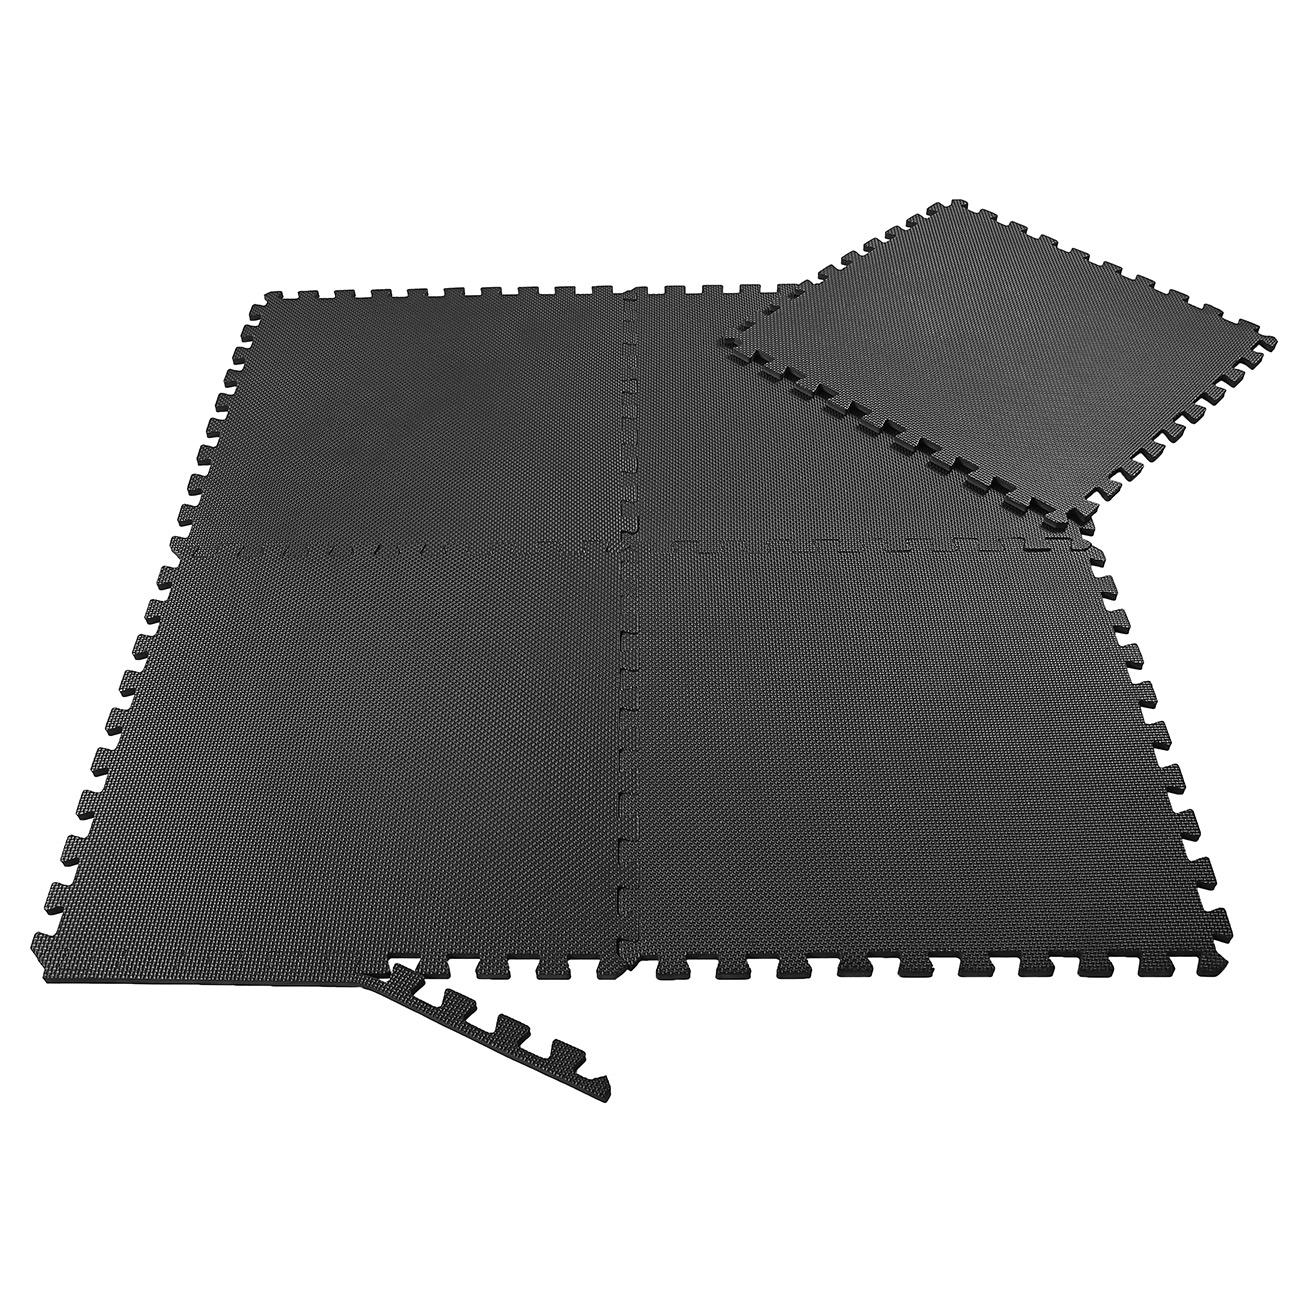 Protection de coffre tapis de sol Protection Tapis Fitness Tapis Tapis Entraînement Tapis Set Bleu